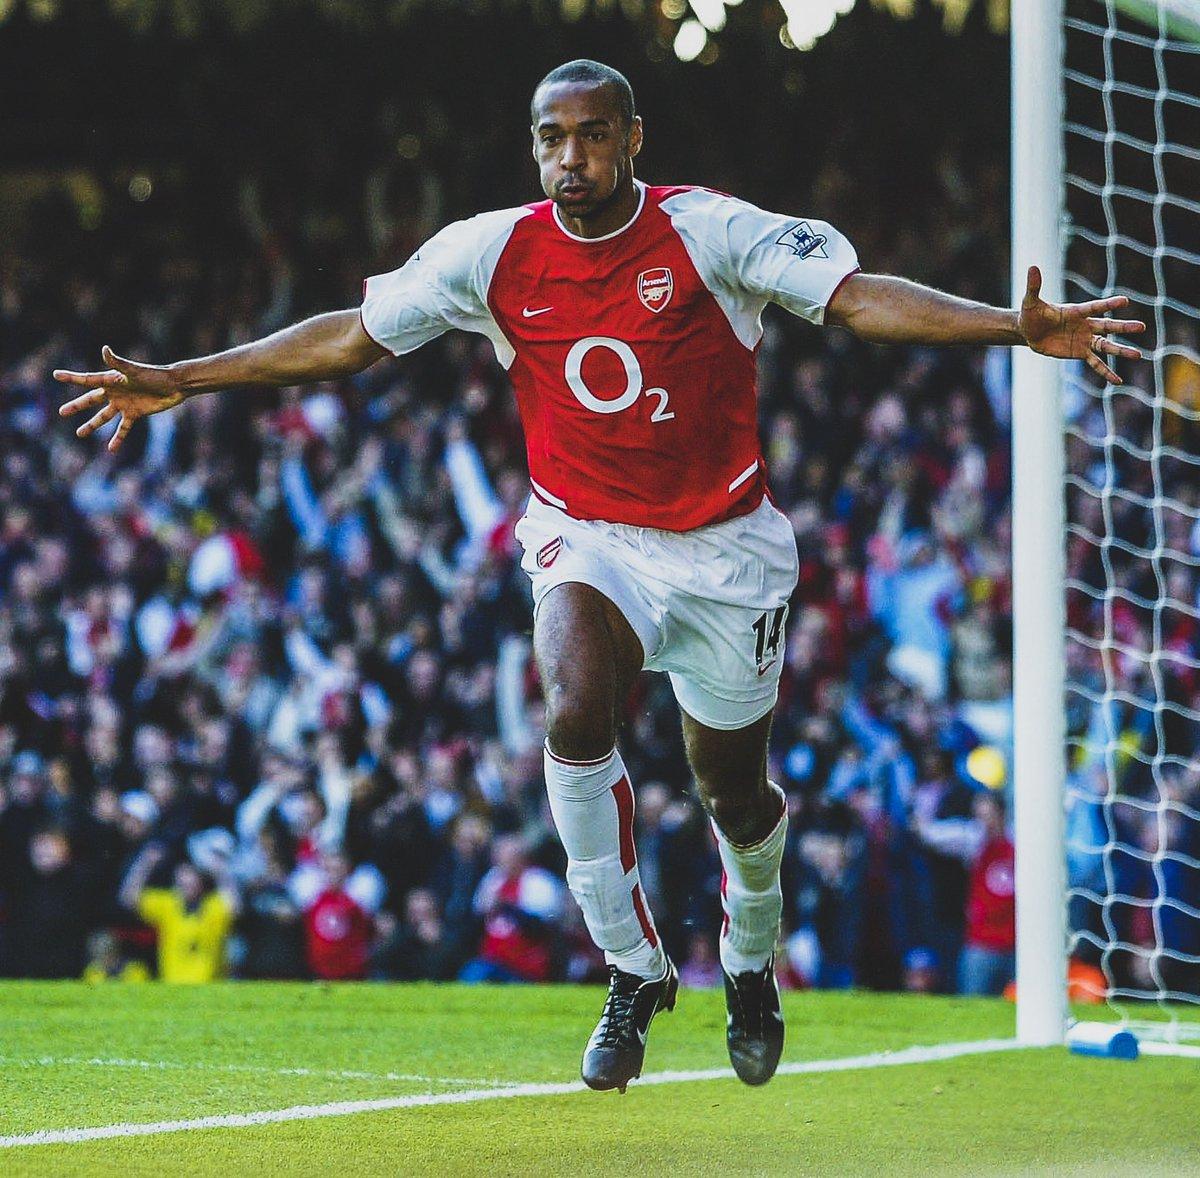 📊 @BBCSport held a poll, which had over 250,000 votes, to decide the @PremierLeague's best ever foreign player:  1️⃣ Henry: 45% 2️⃣ Ronaldo: 14% 3️⃣ Cantona: 12% 4️⃣ Aguero: 8% 5️⃣ Drogba: 6% 6️⃣ P. Schmeichel: 5% 7️⃣ David Silva: 2% 8️⃣ Vidic: 2% 9️⃣ Vieira: 2% 🔟 Kompany: 2%  🤔 Agree?